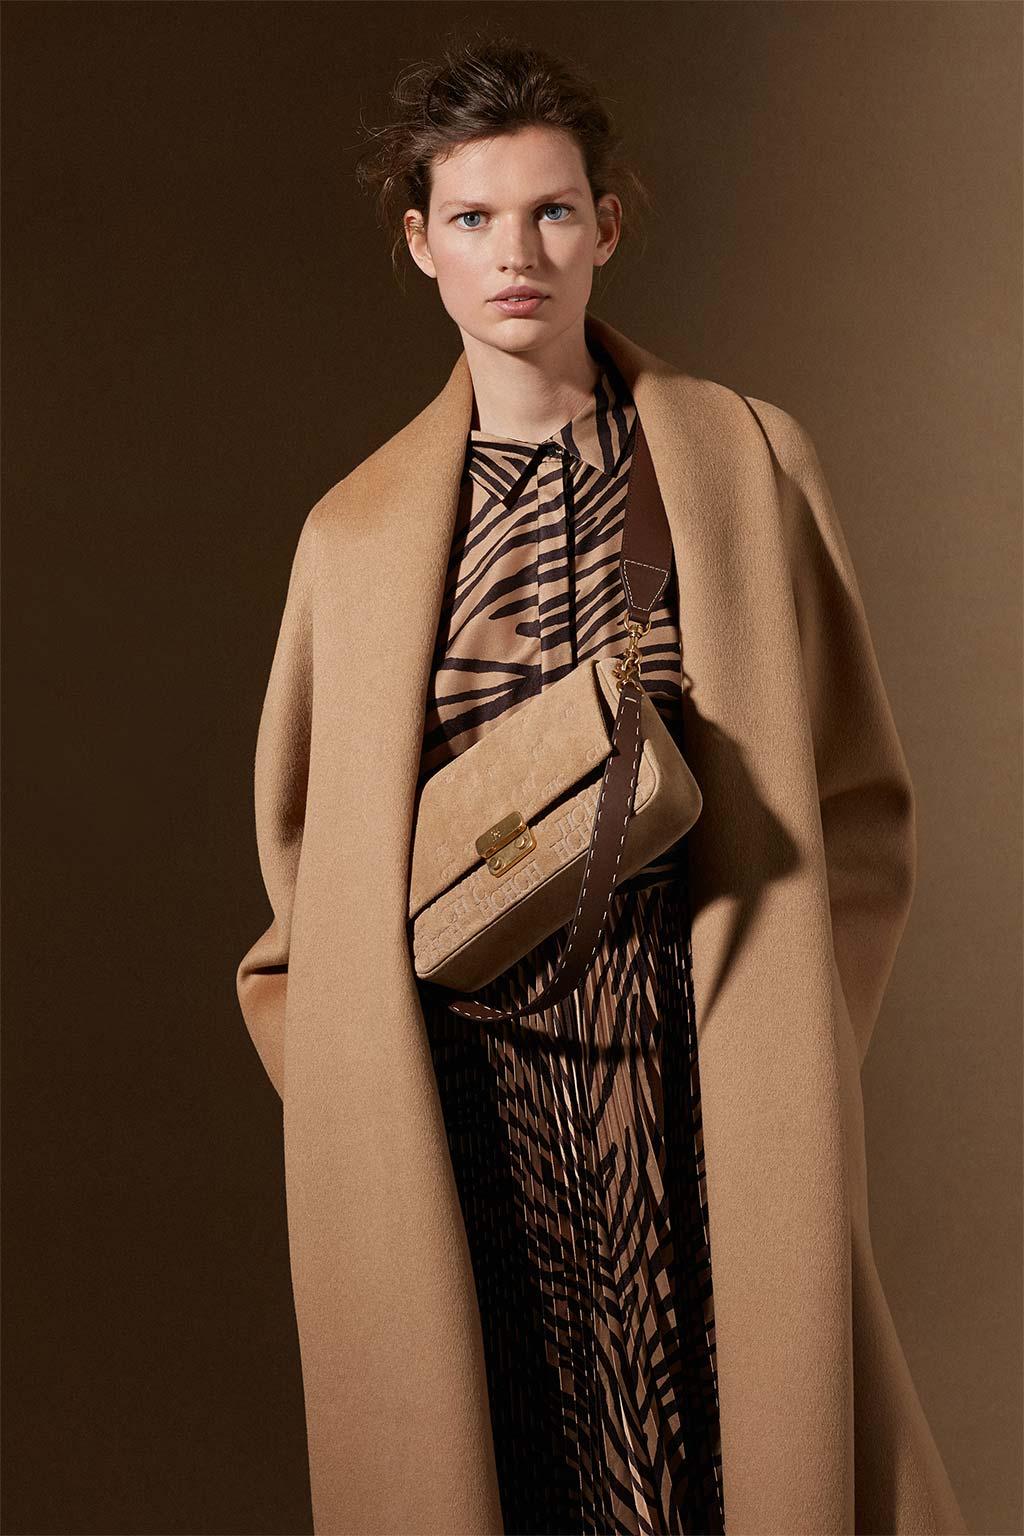 CH Carolina Herrera. New womenswear collection Spotlight. Look 13